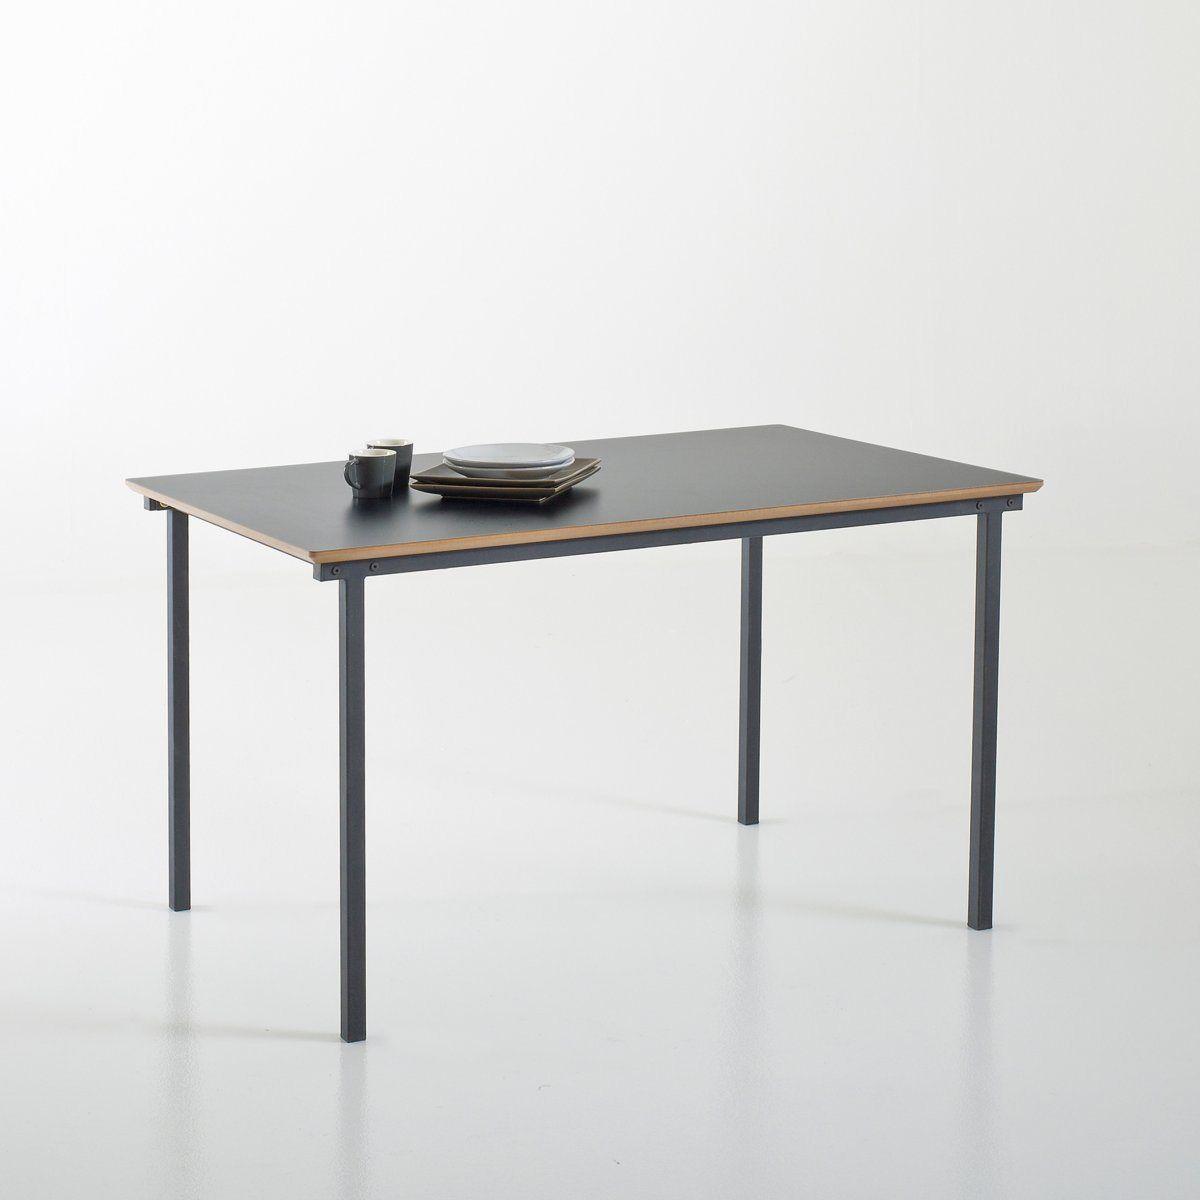 La redoute soldes meubles beautiful we handpicked all - Meubles la redoute nouvelle collection ...